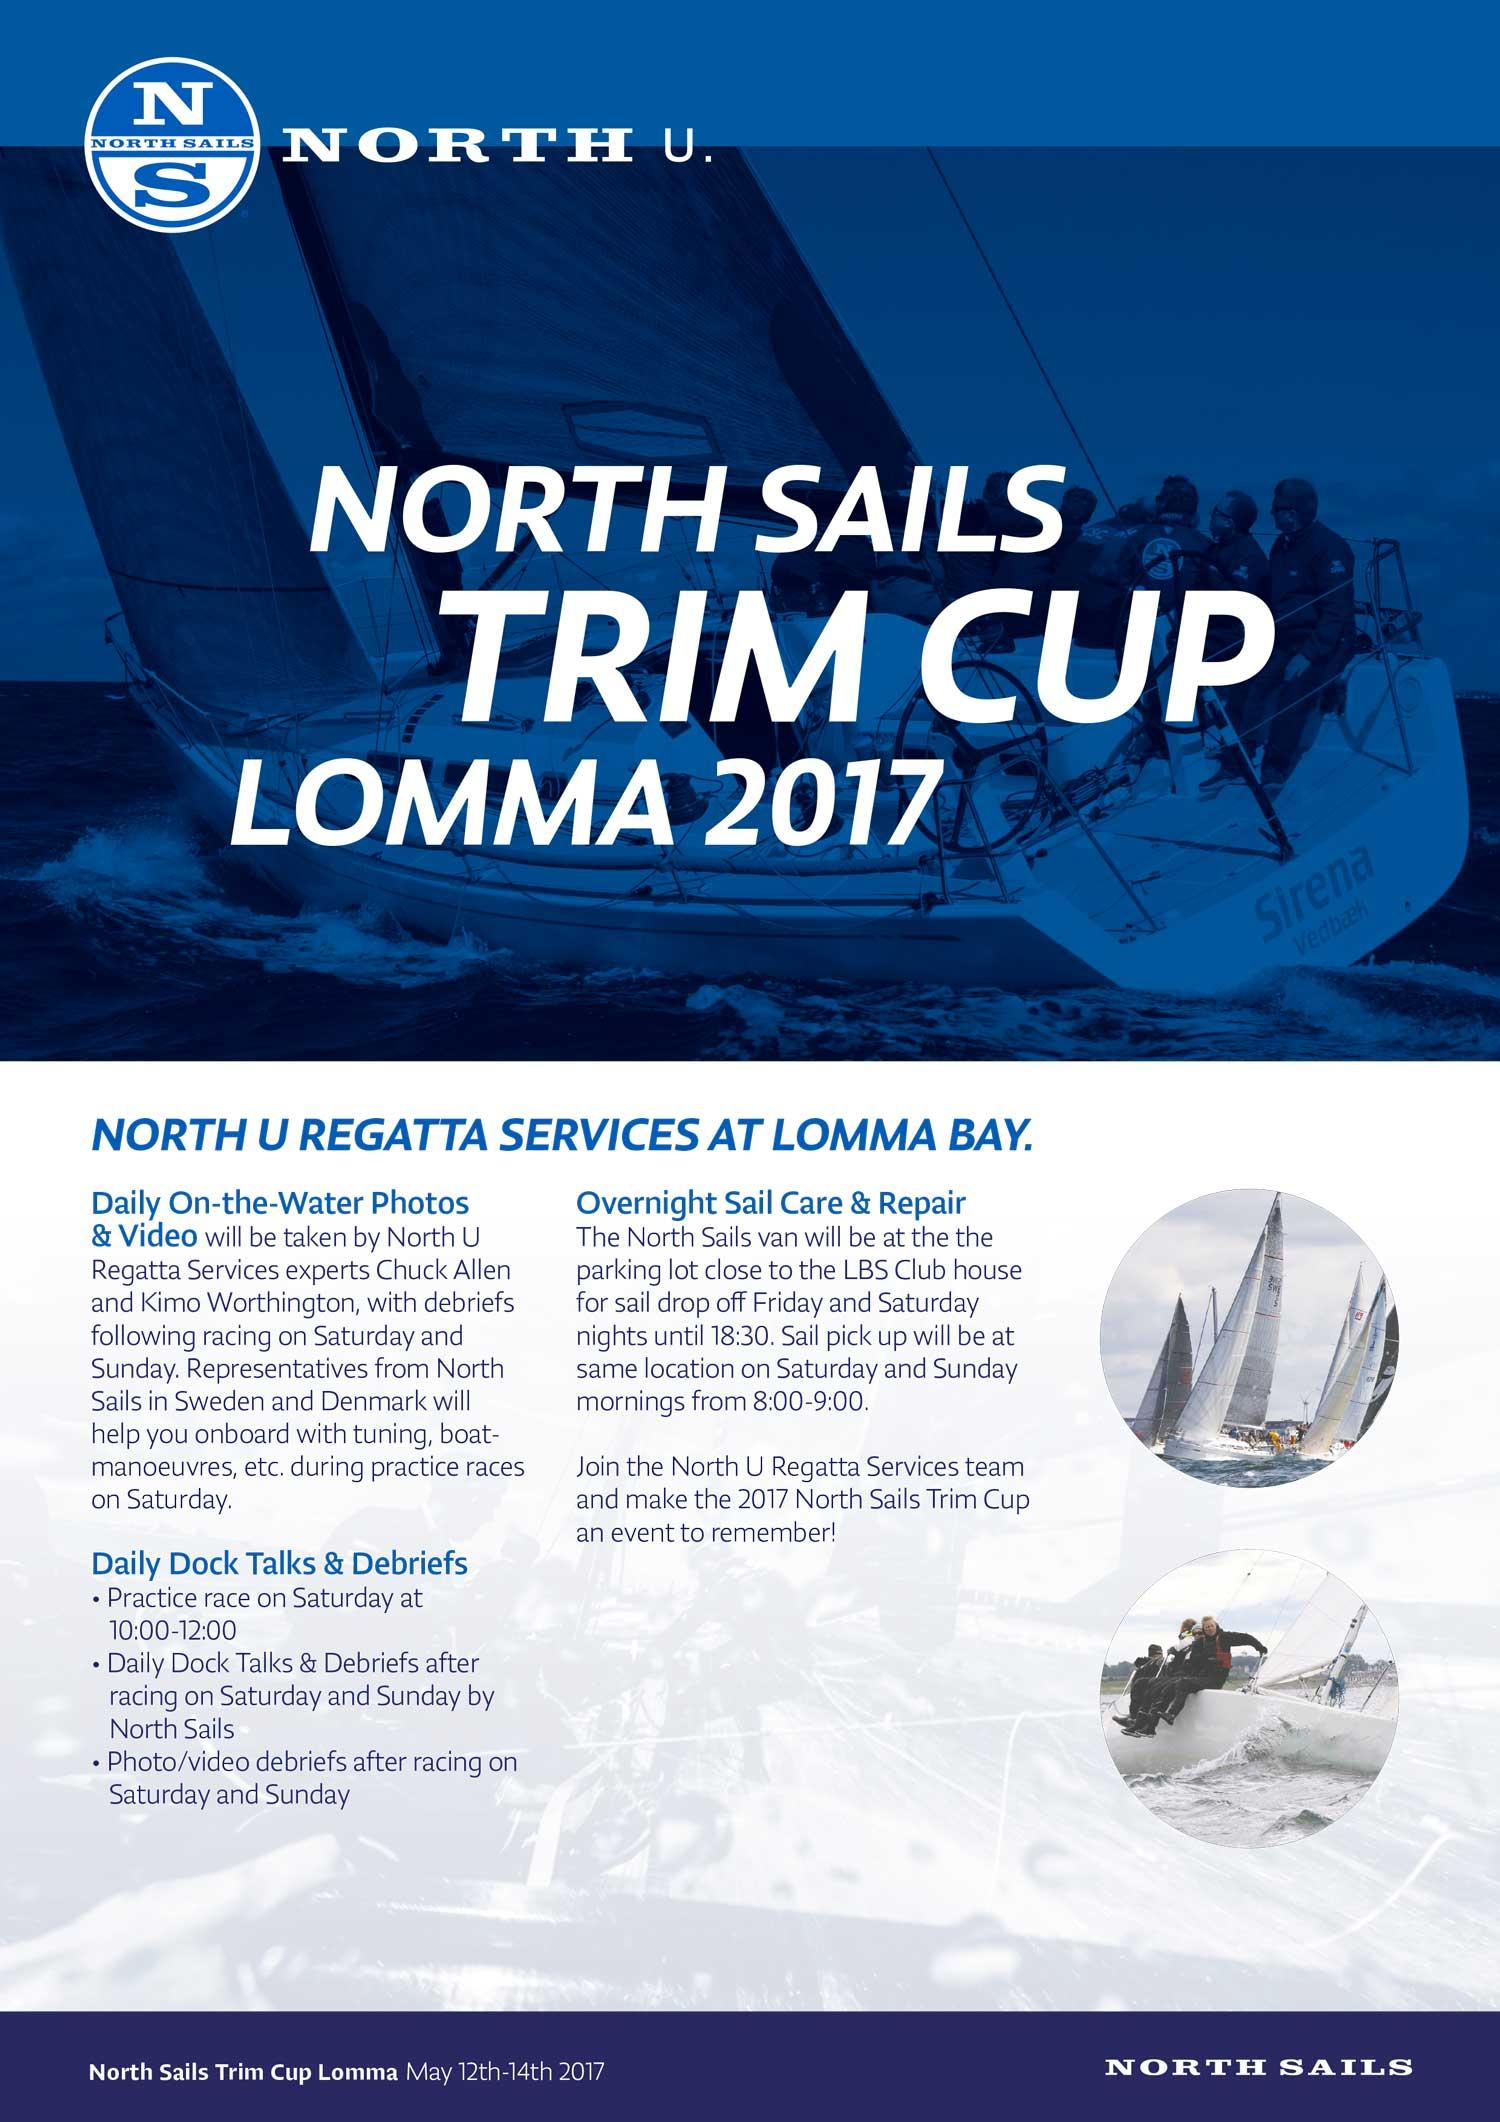 Missa inte North Sails Trim Cup i Lomma